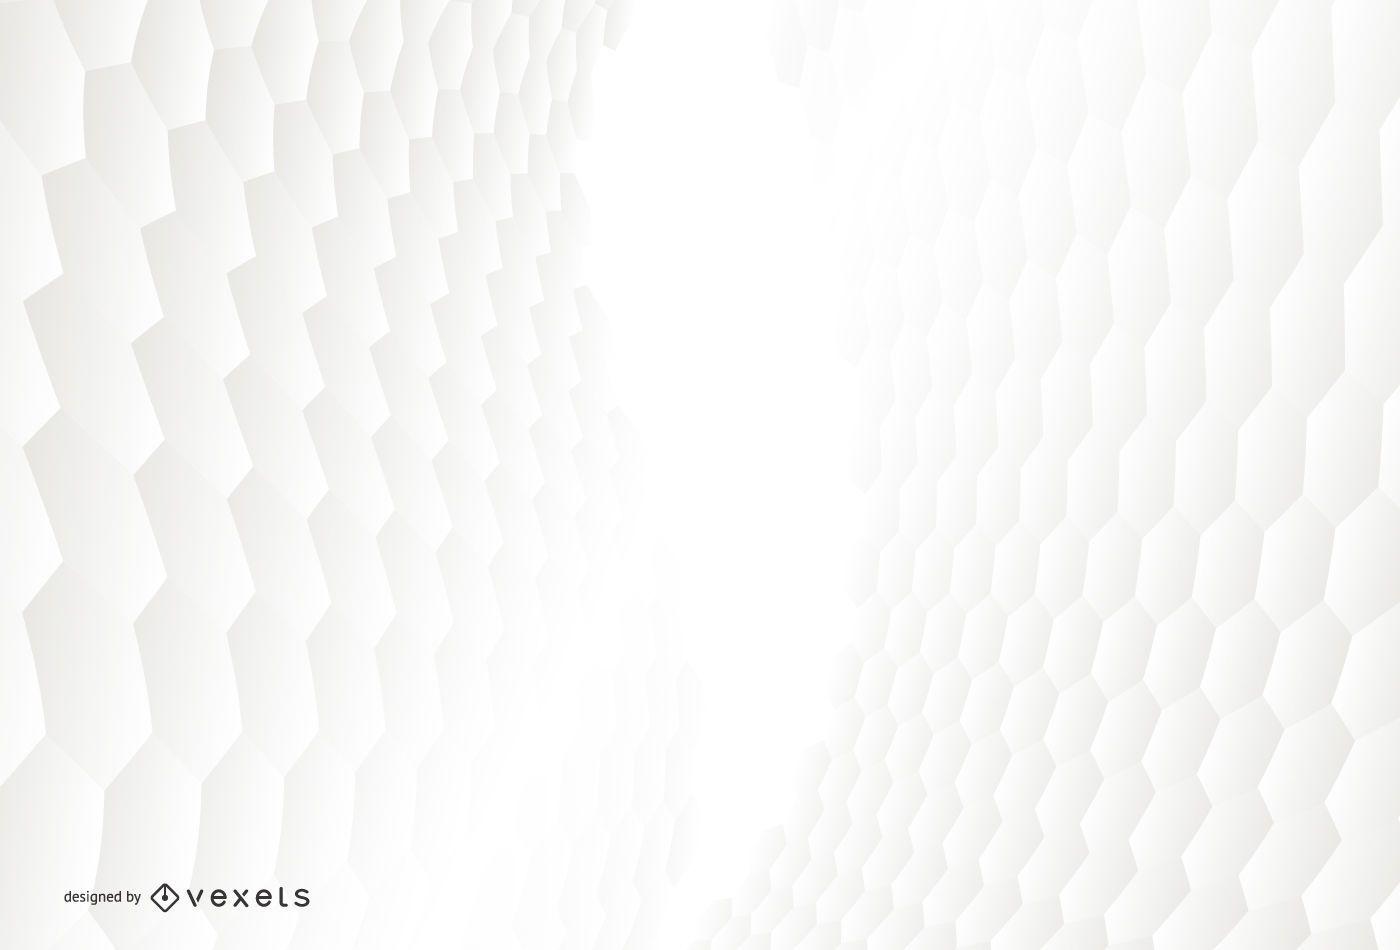 Fondo blanco con textura